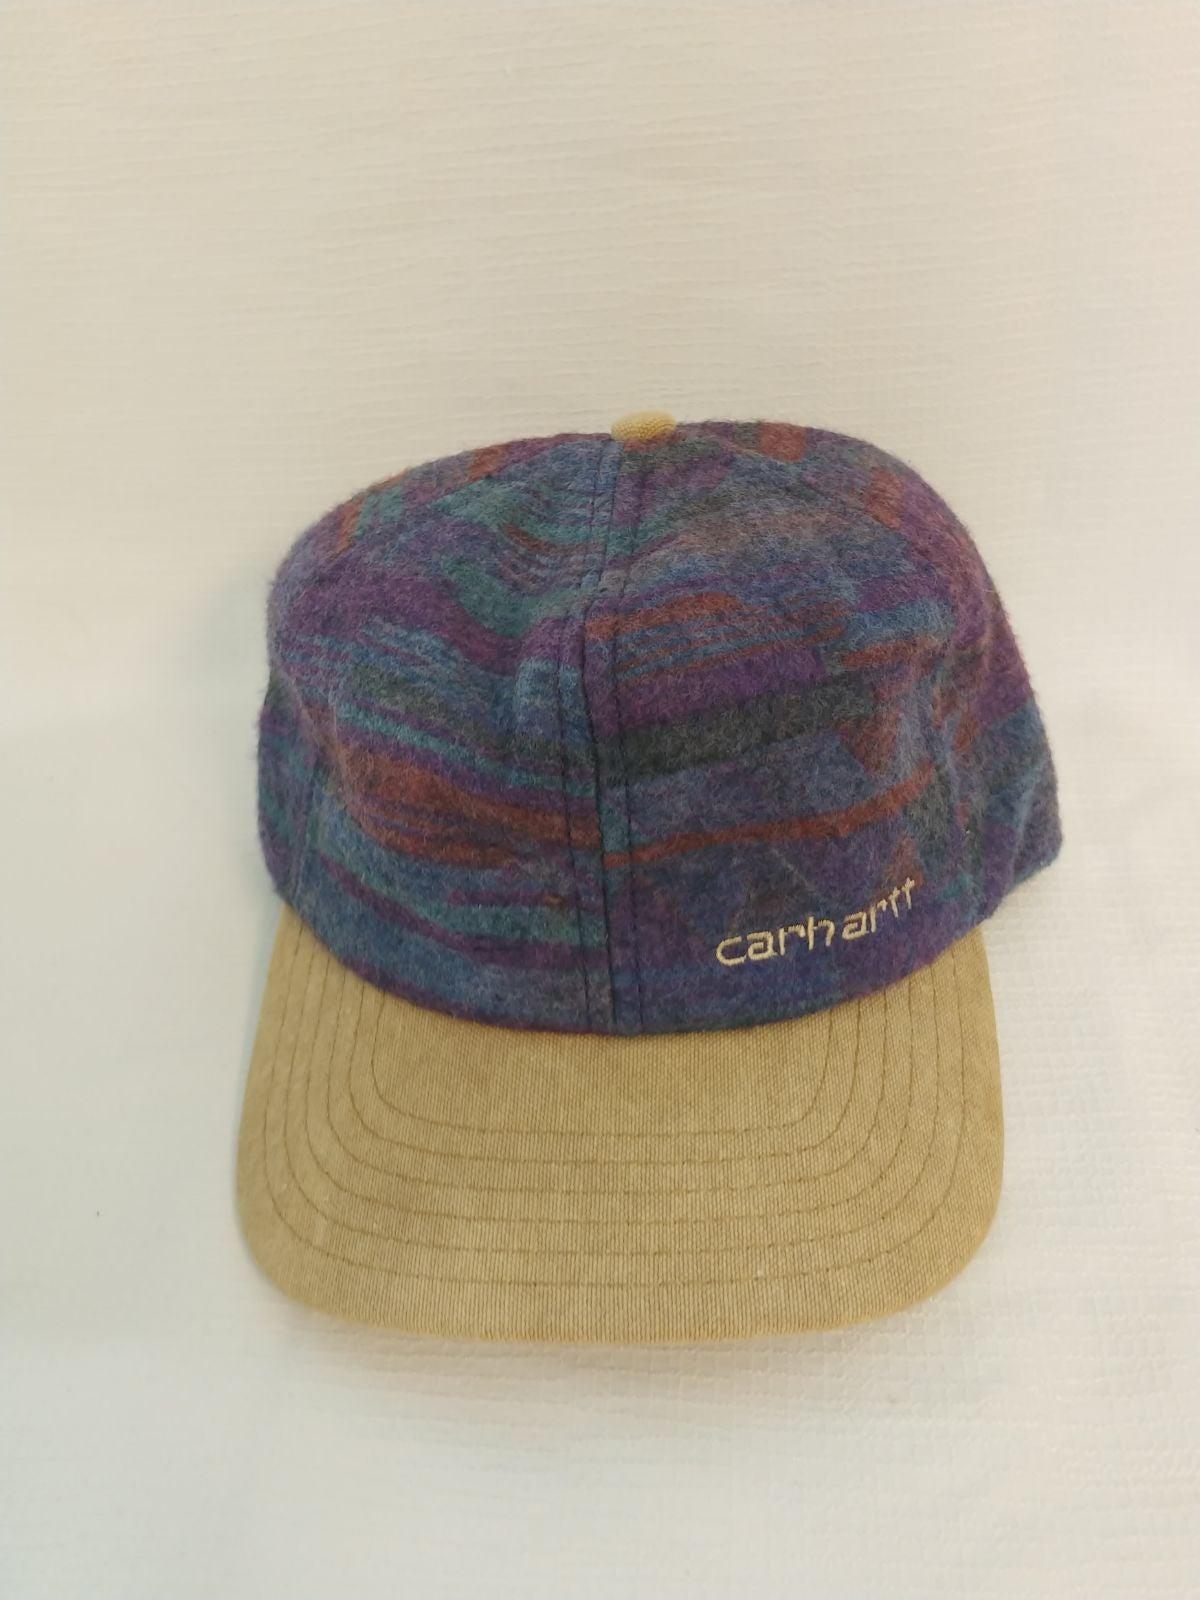 Vintage Carhartt wool snapback